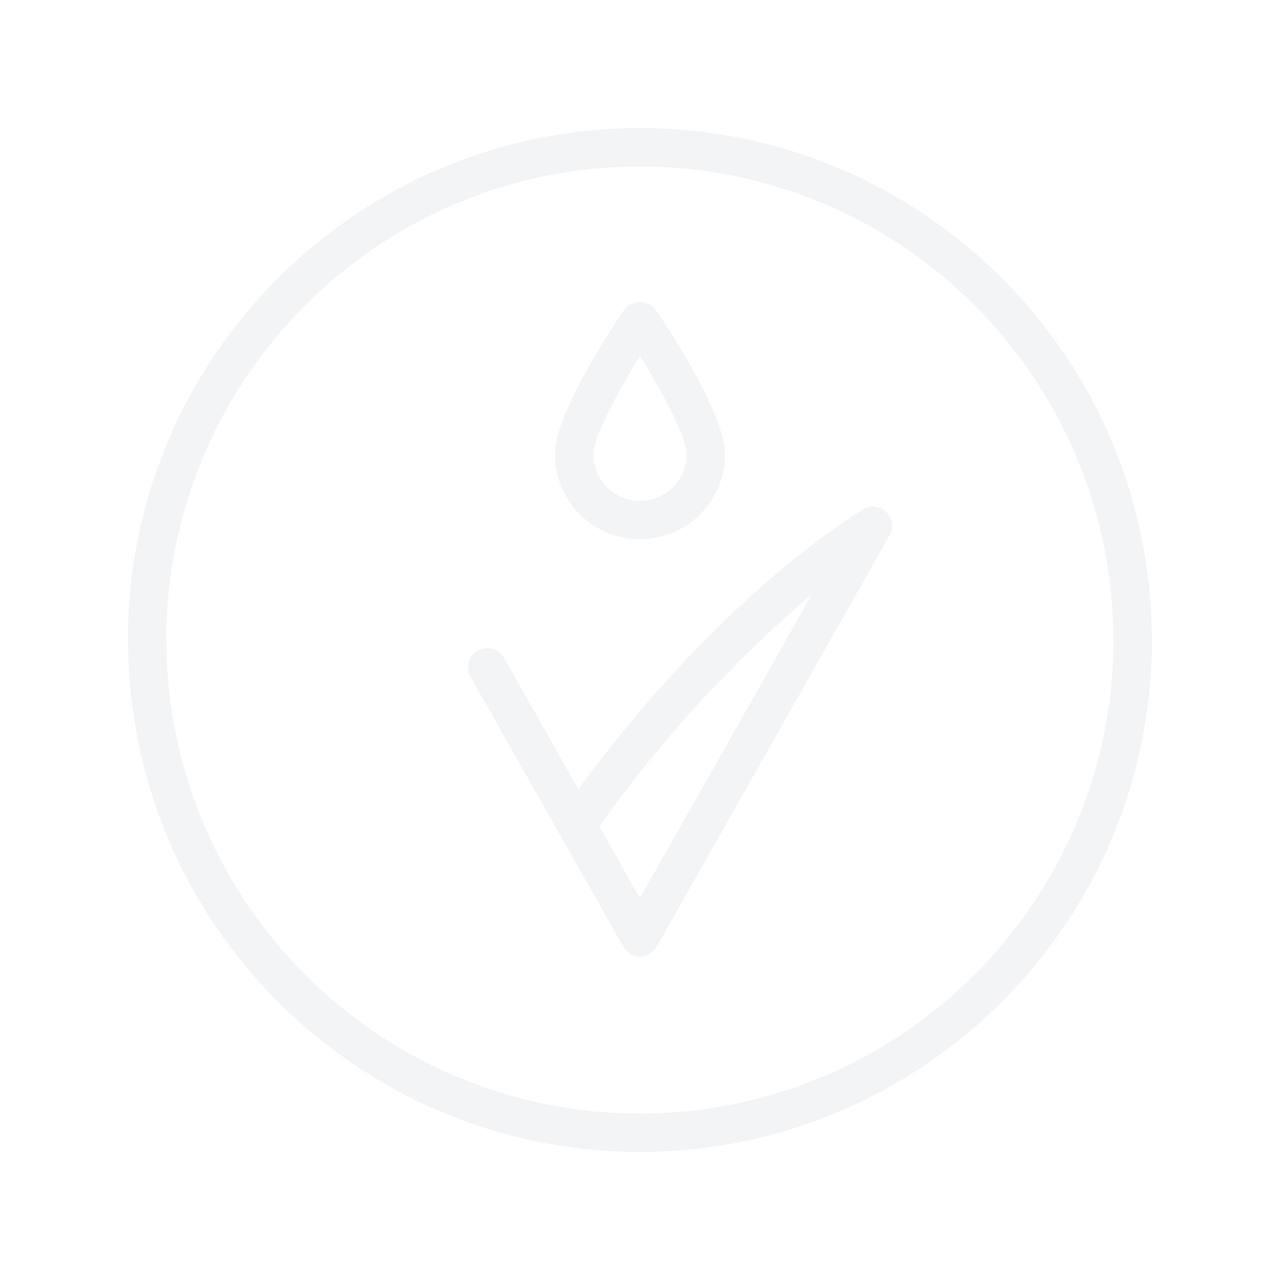 SUPERMOOD Beauty Sleep Youth Restoring Night Cream высокоувлажняющий ночной крем 30ml